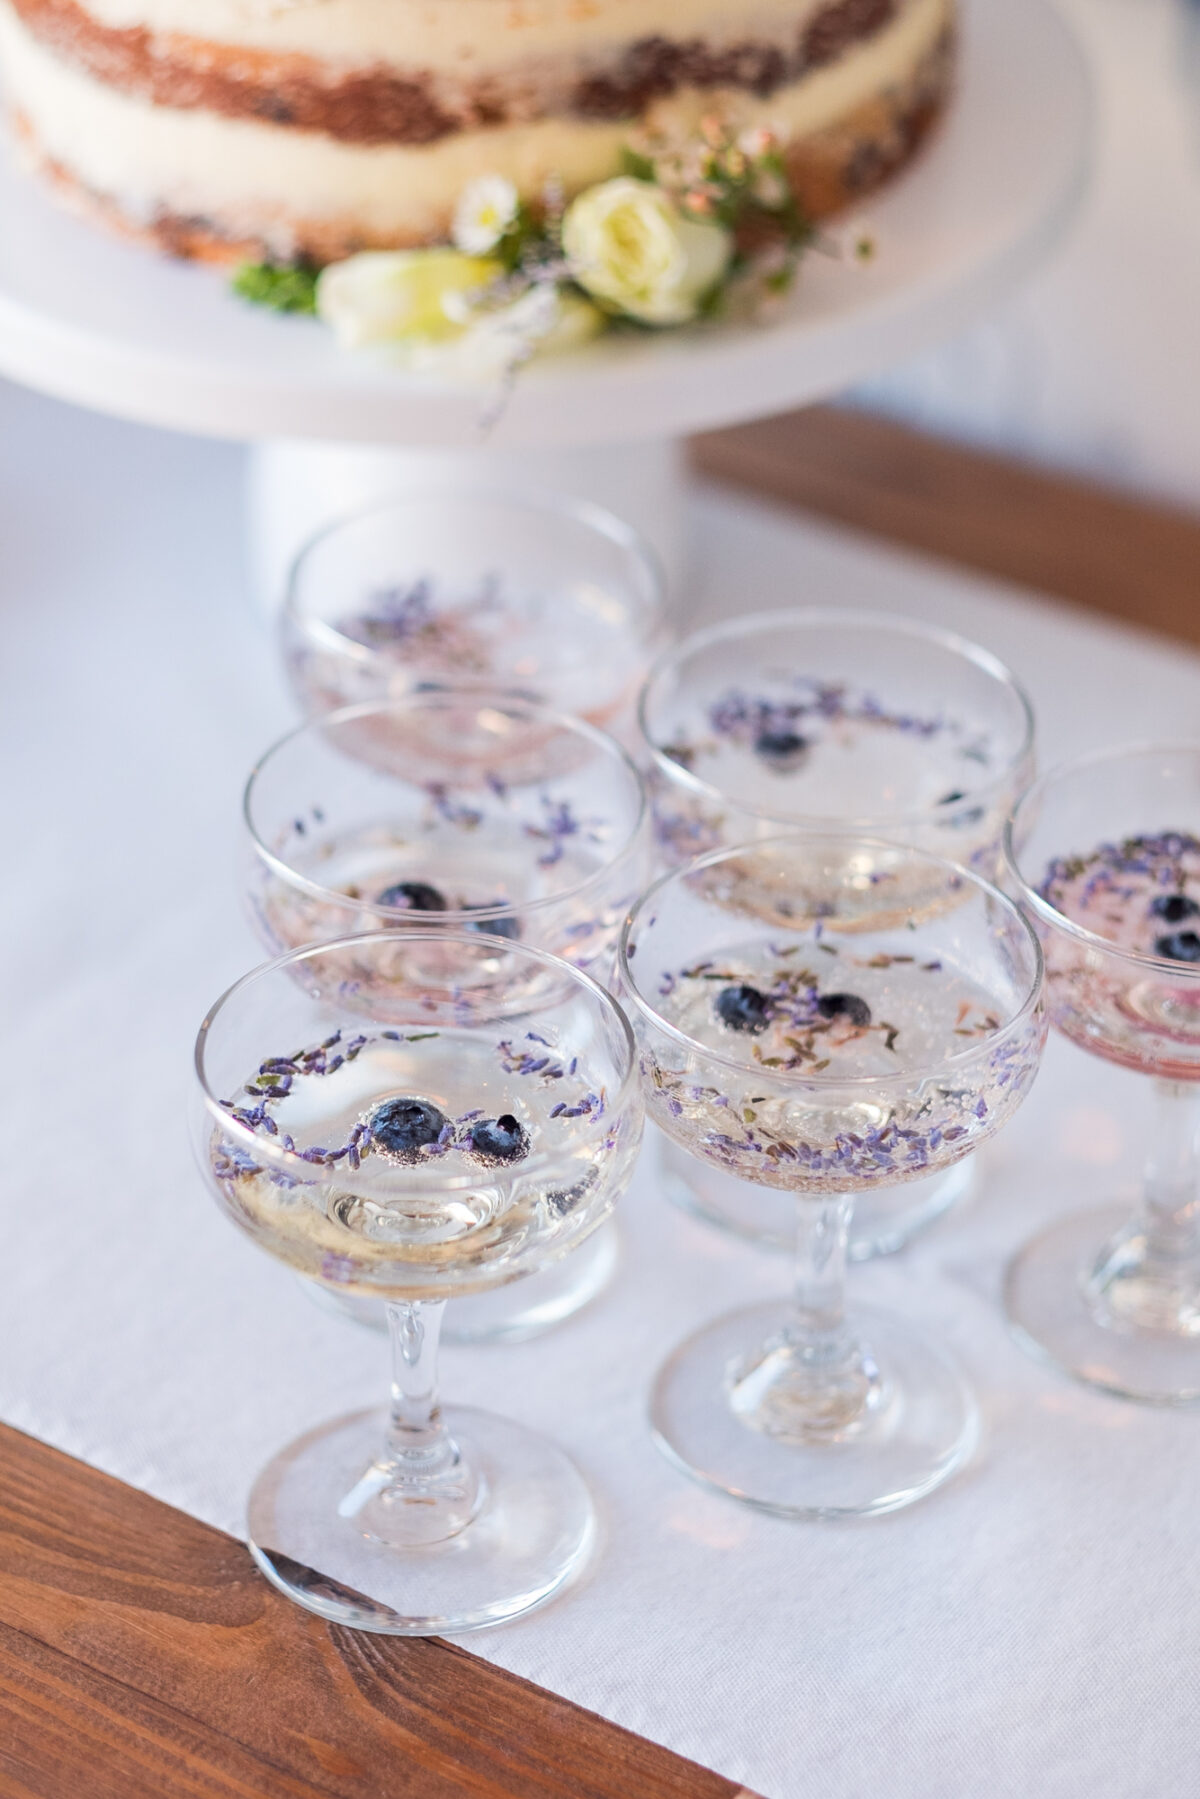 lavendar champagne (christine yoo)